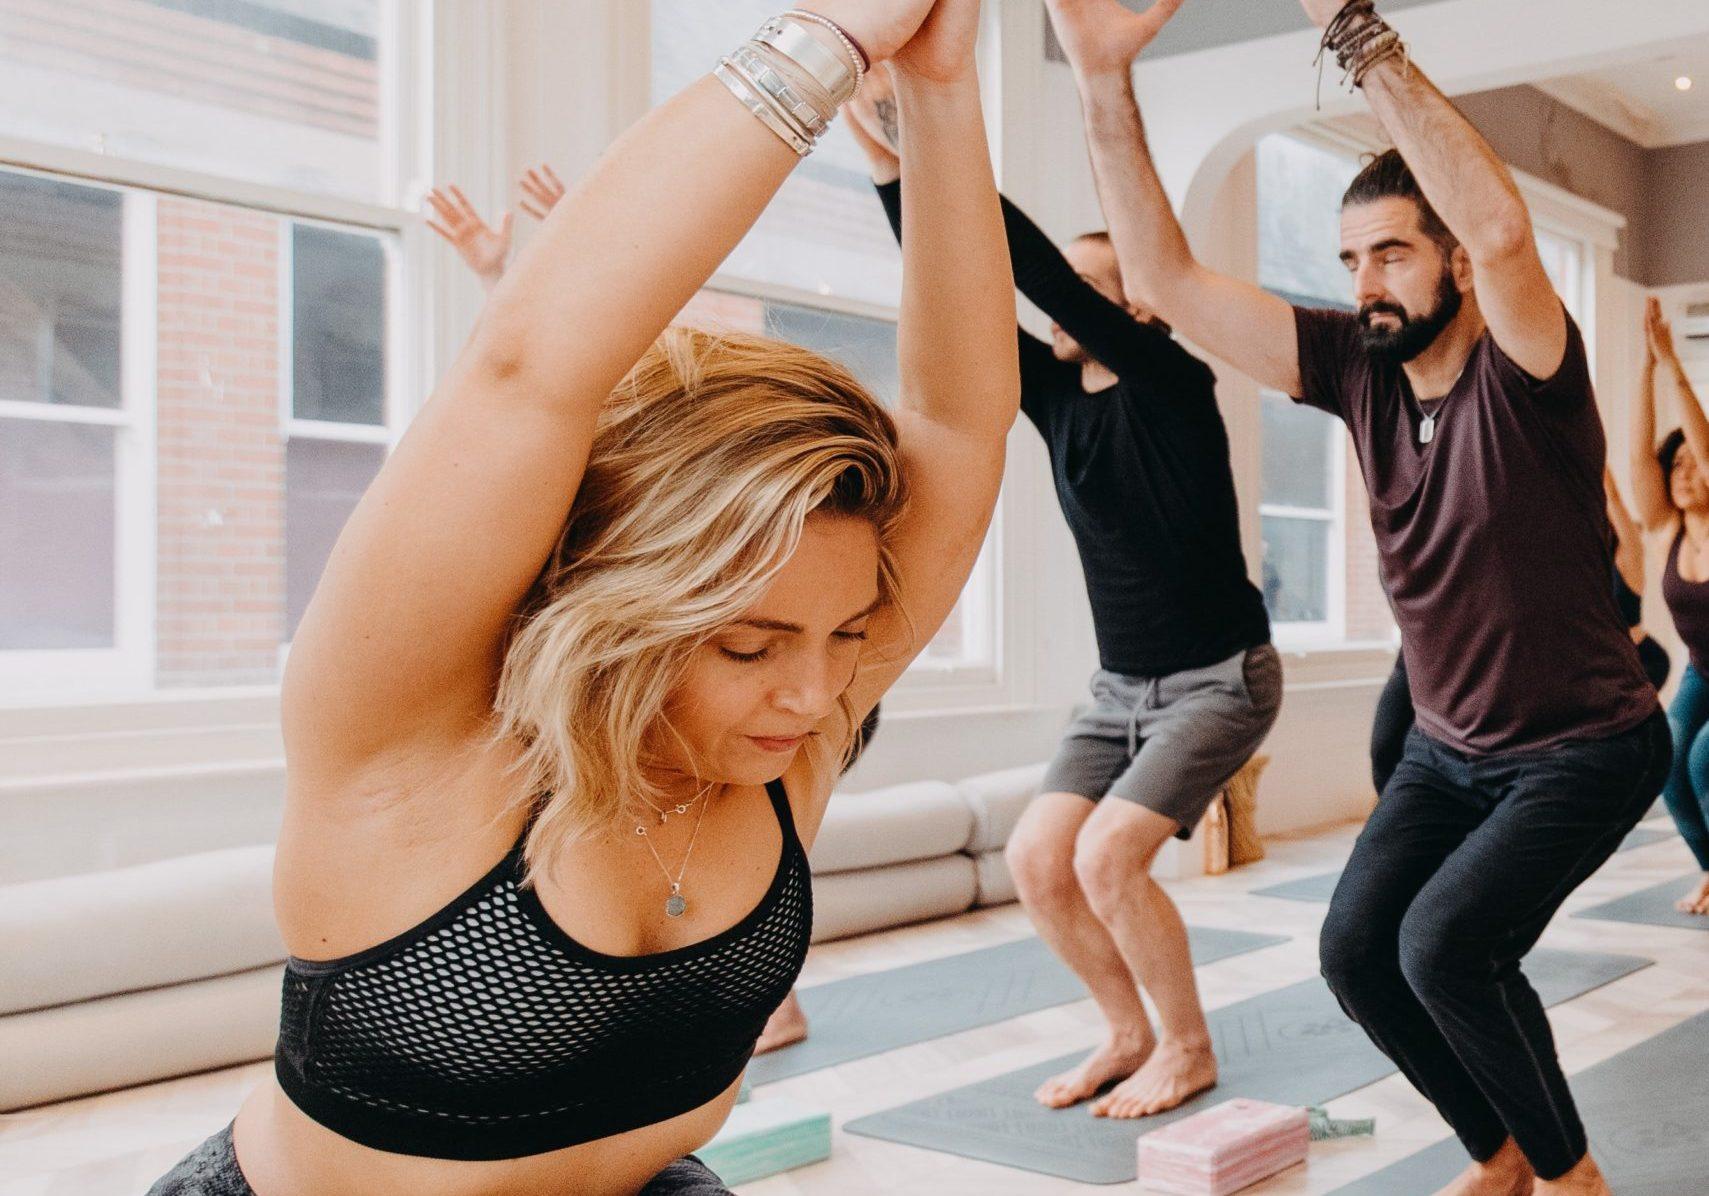 Coco-Yoga-2020-048-min-2.jpg